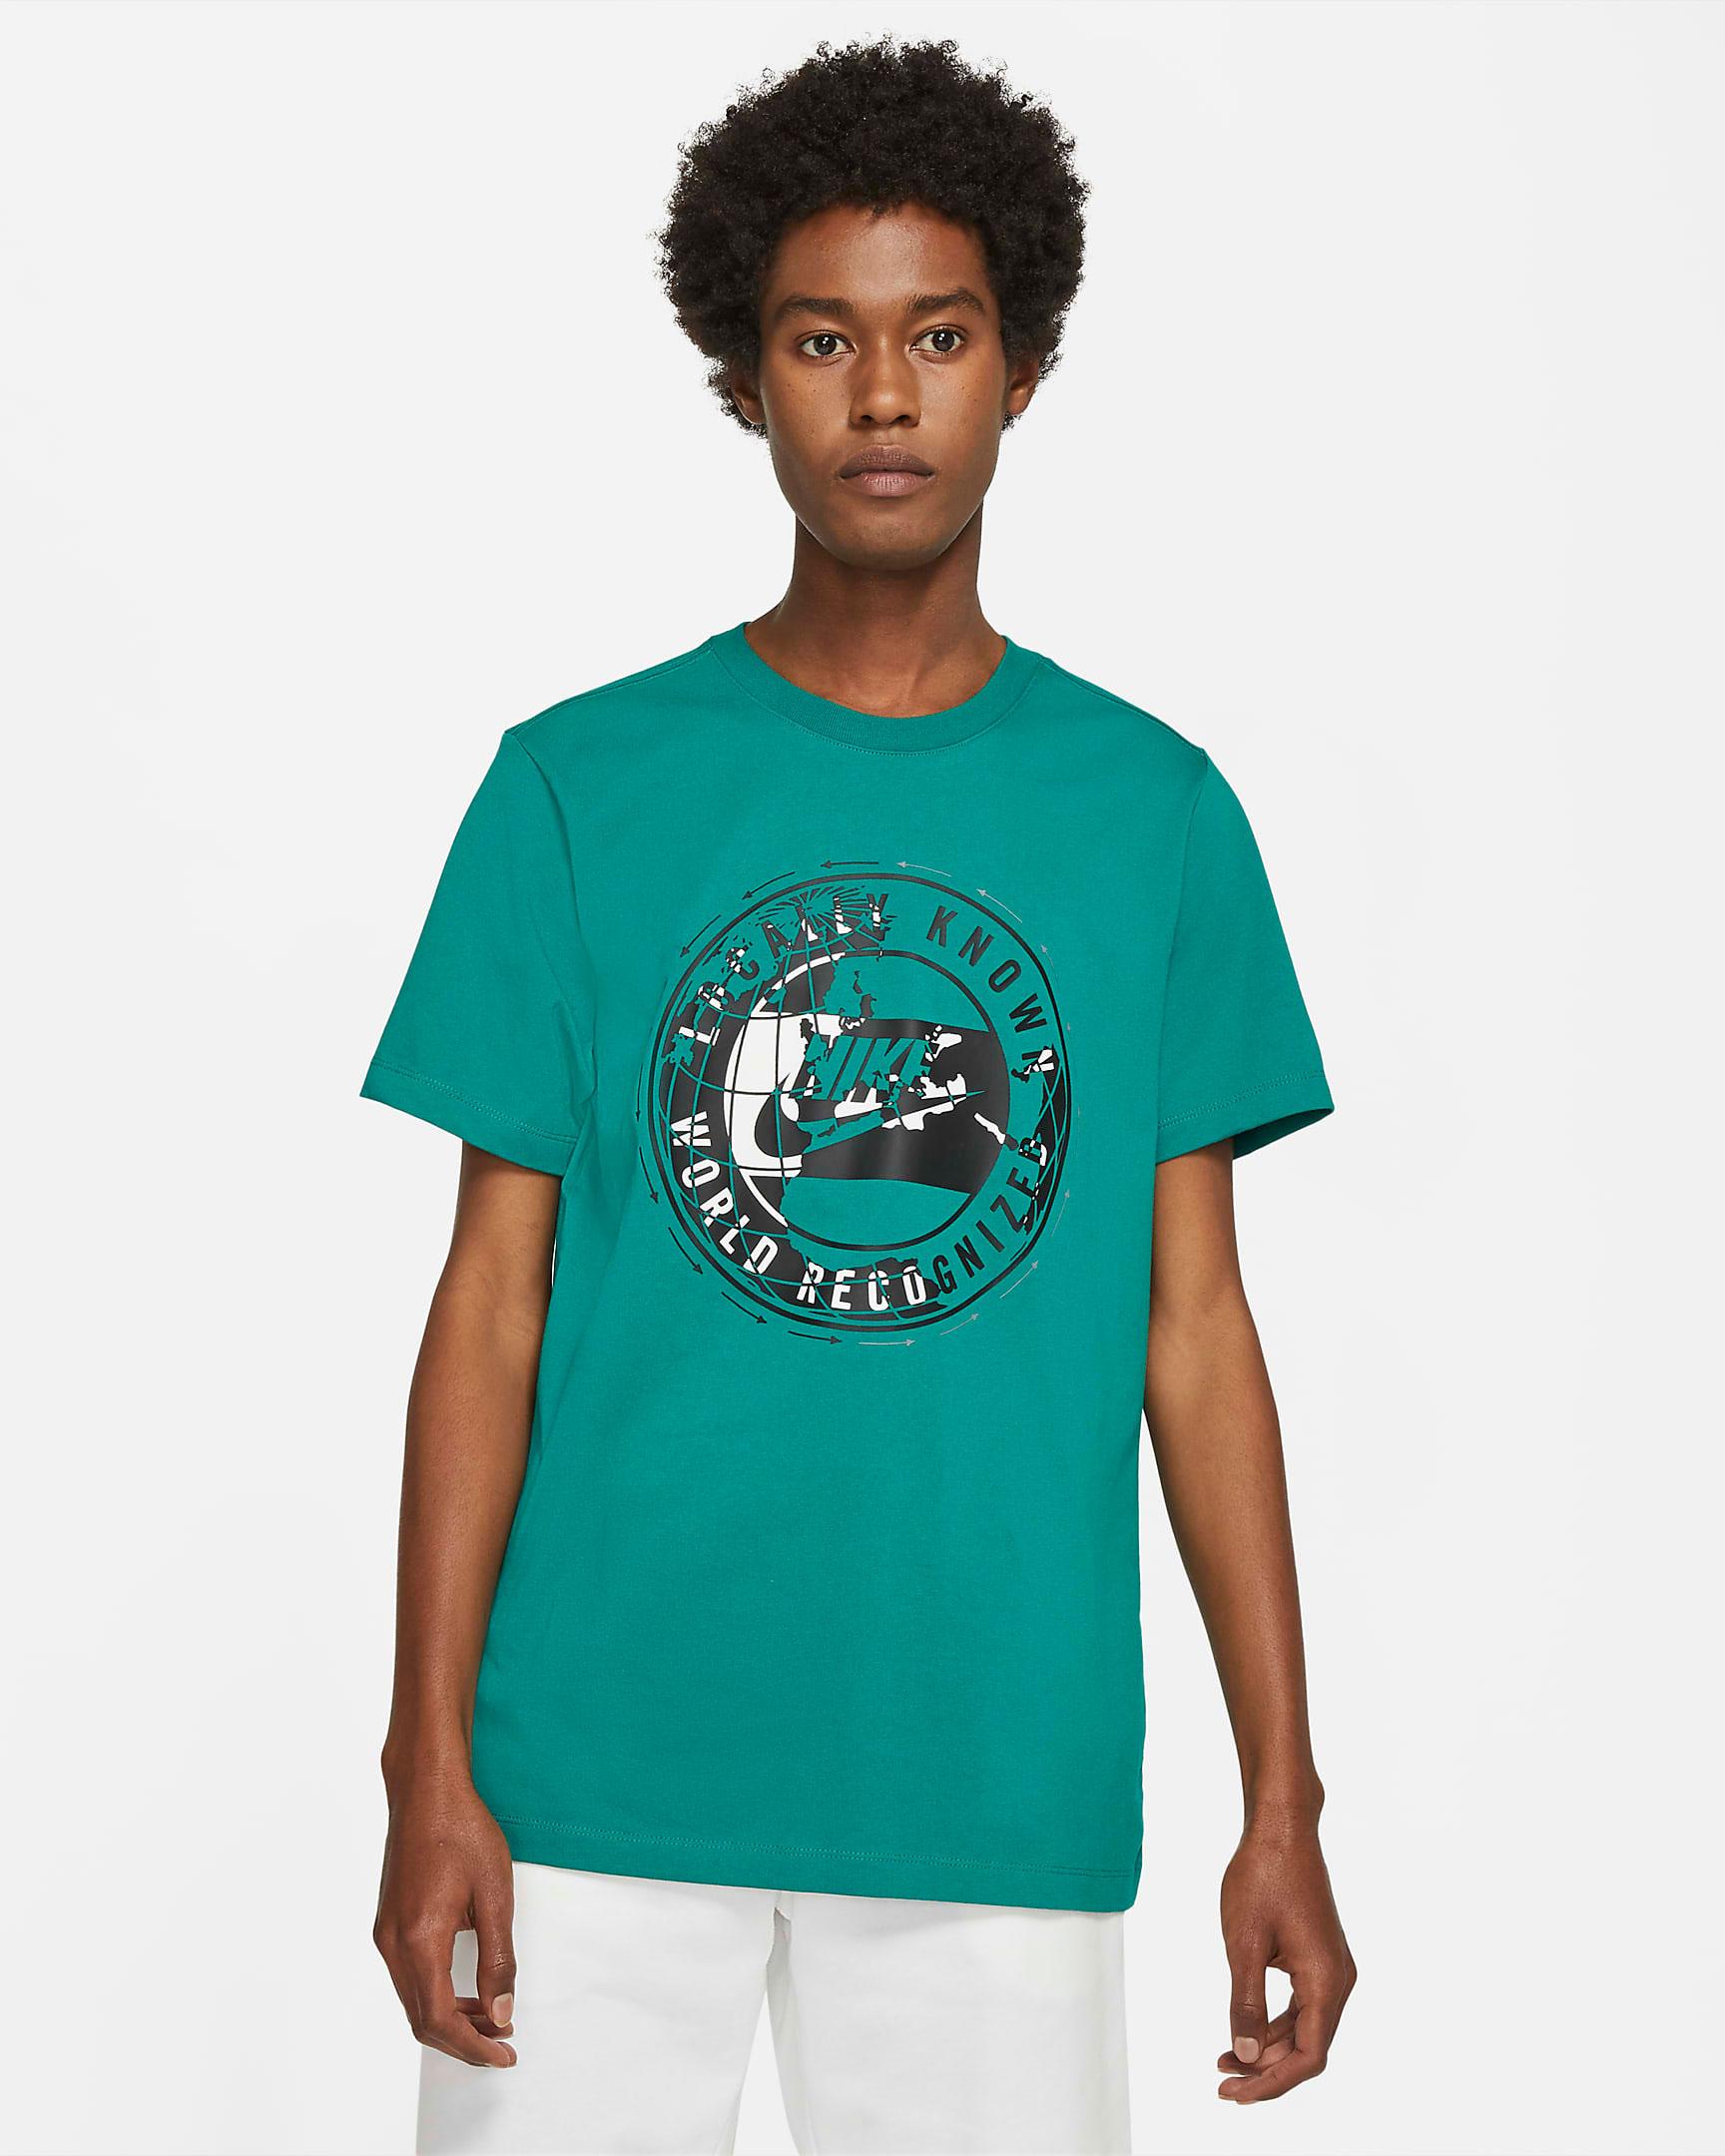 nike-air-max-90-spruce-lime-shirt